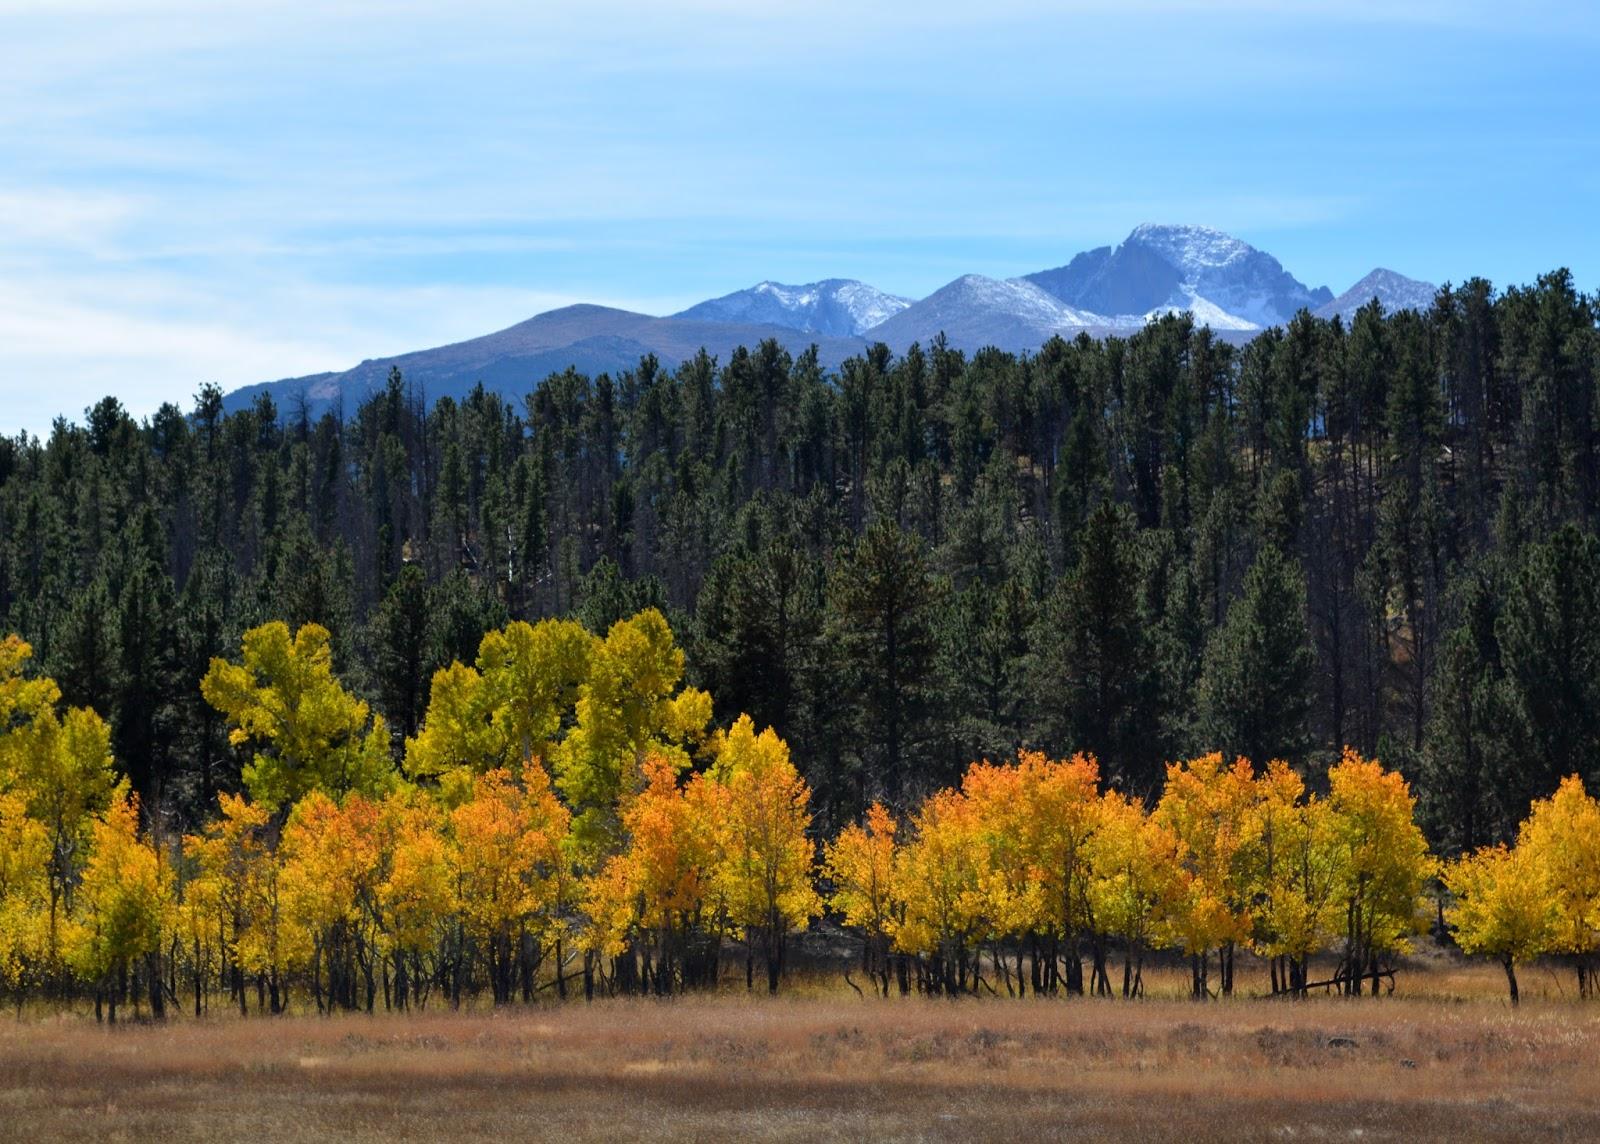 cozy birdhouse | beautiful fall foliage on the aspens at rocky mountain national park